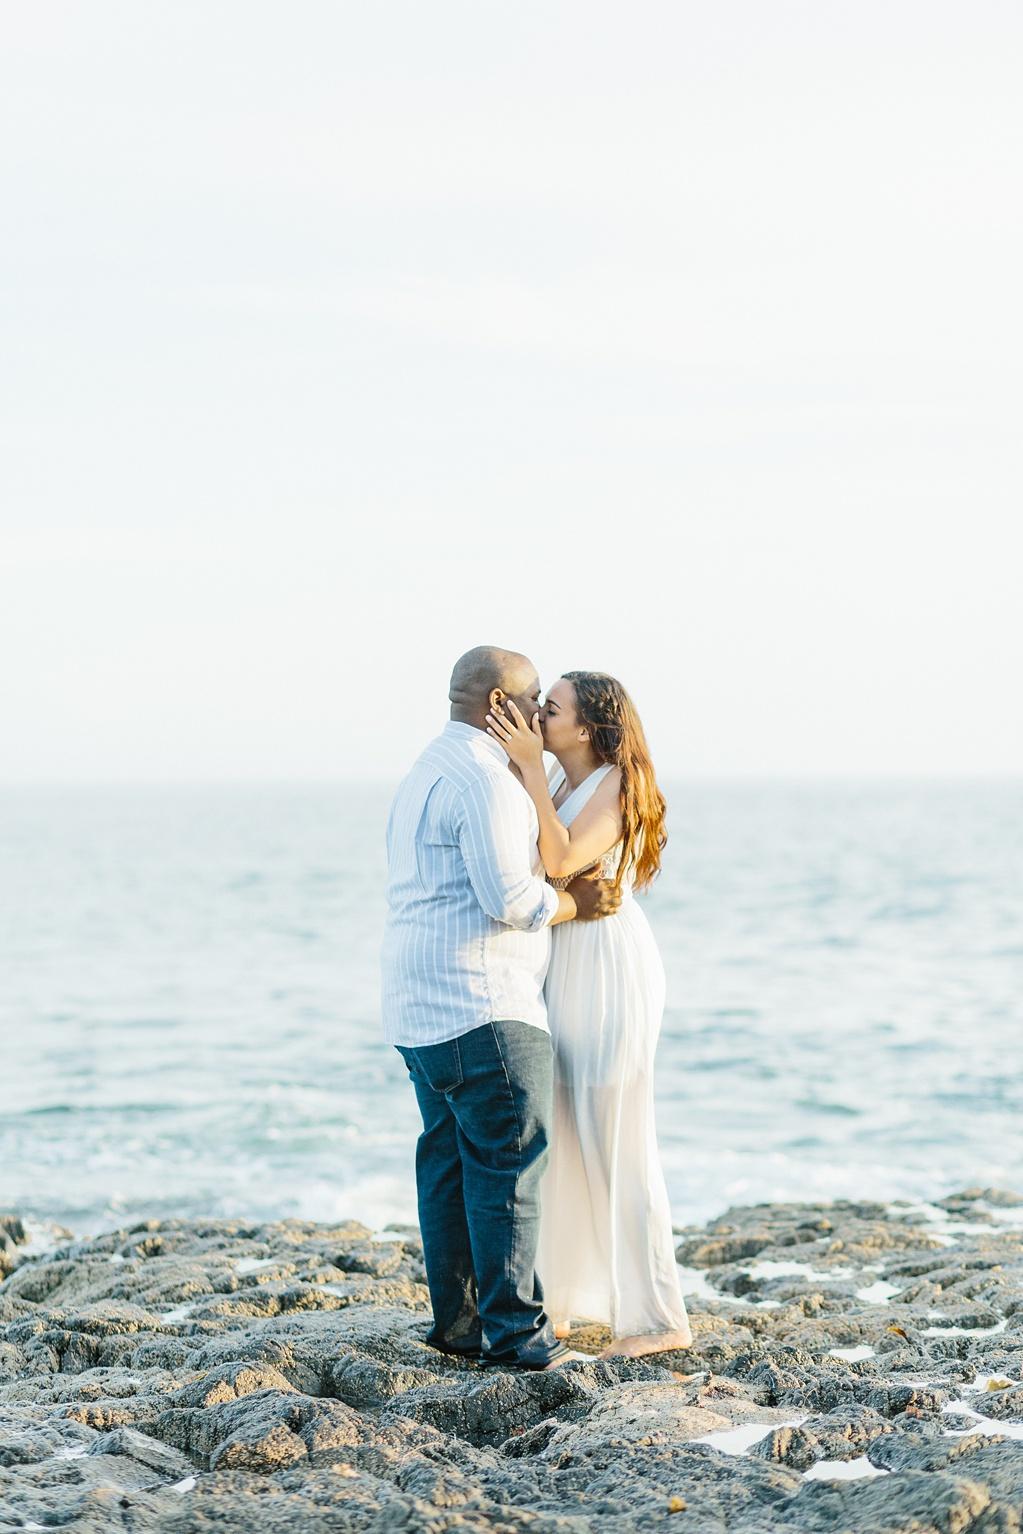 Laguna Beach Engagement, CA: Joshua + Ashley. A sweet and playful engagement session at Laguna Beach by wedding photographer Madison Ellis. (22)